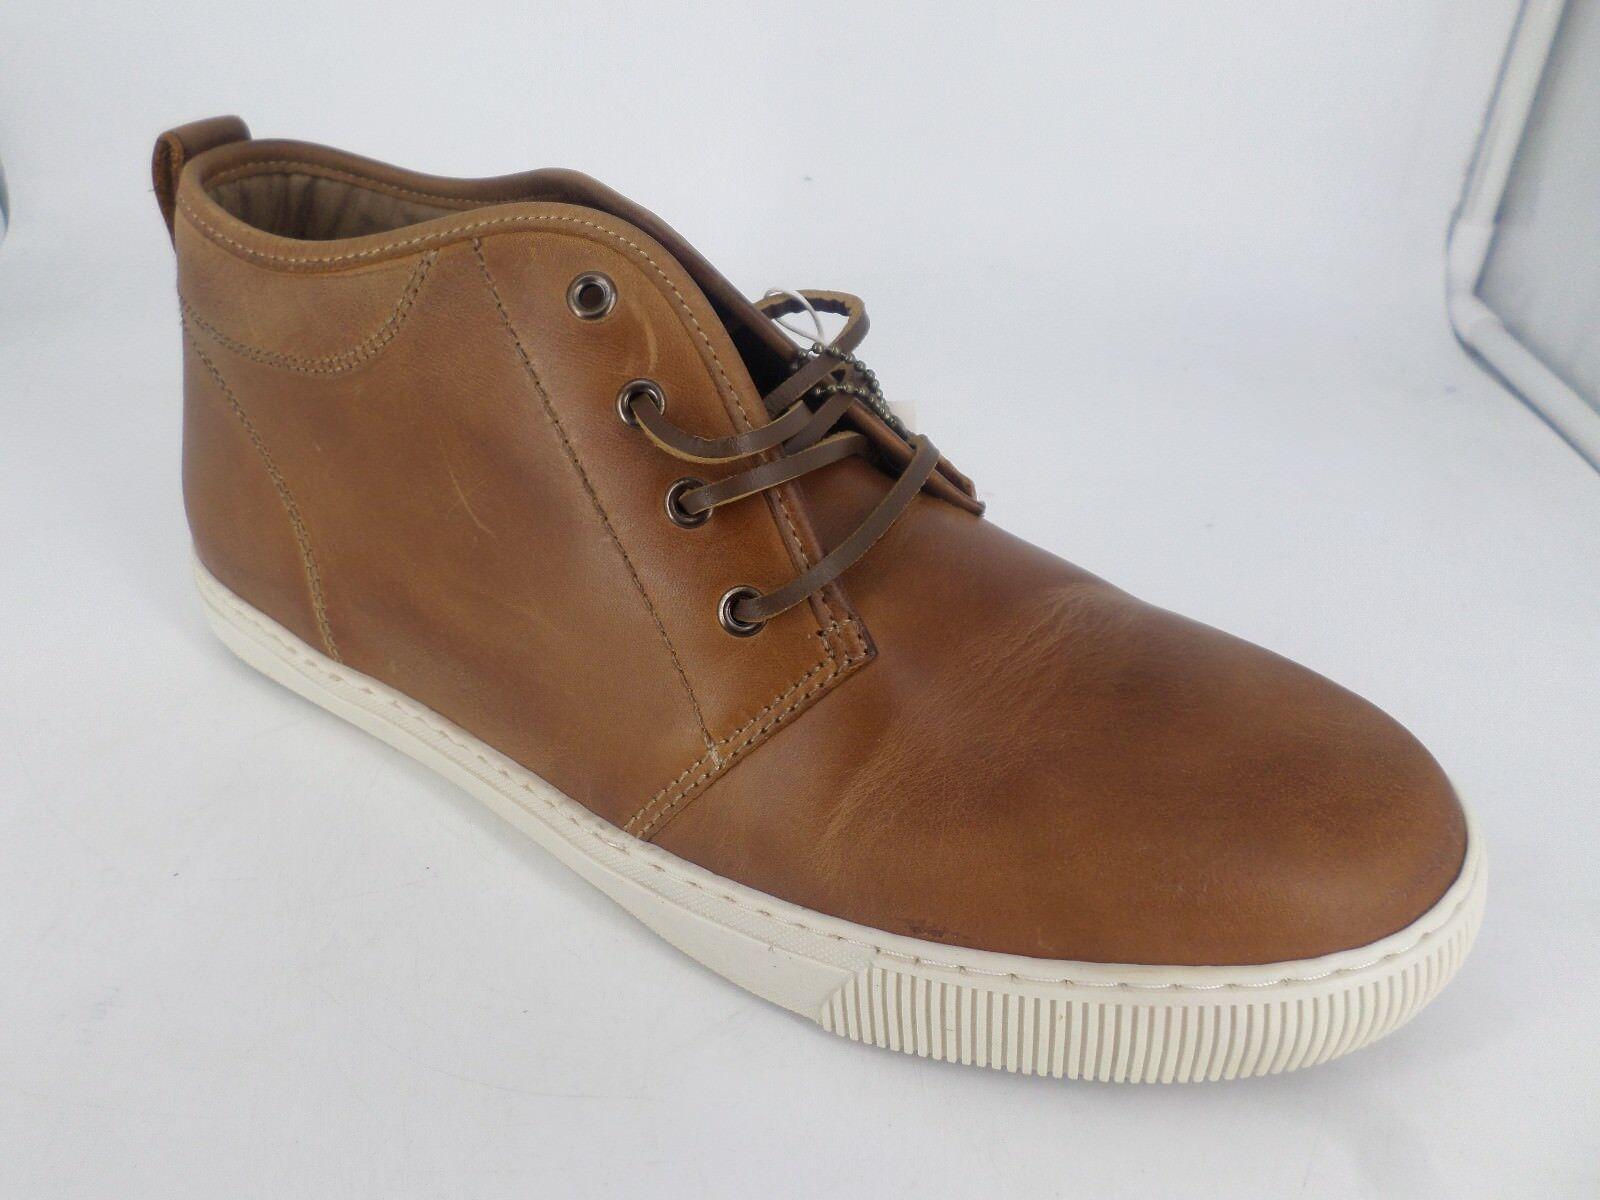 H&M Mens Leather Trainers Hi Top Boots Cognac Brown Eur 44 EM22 64 SALEw